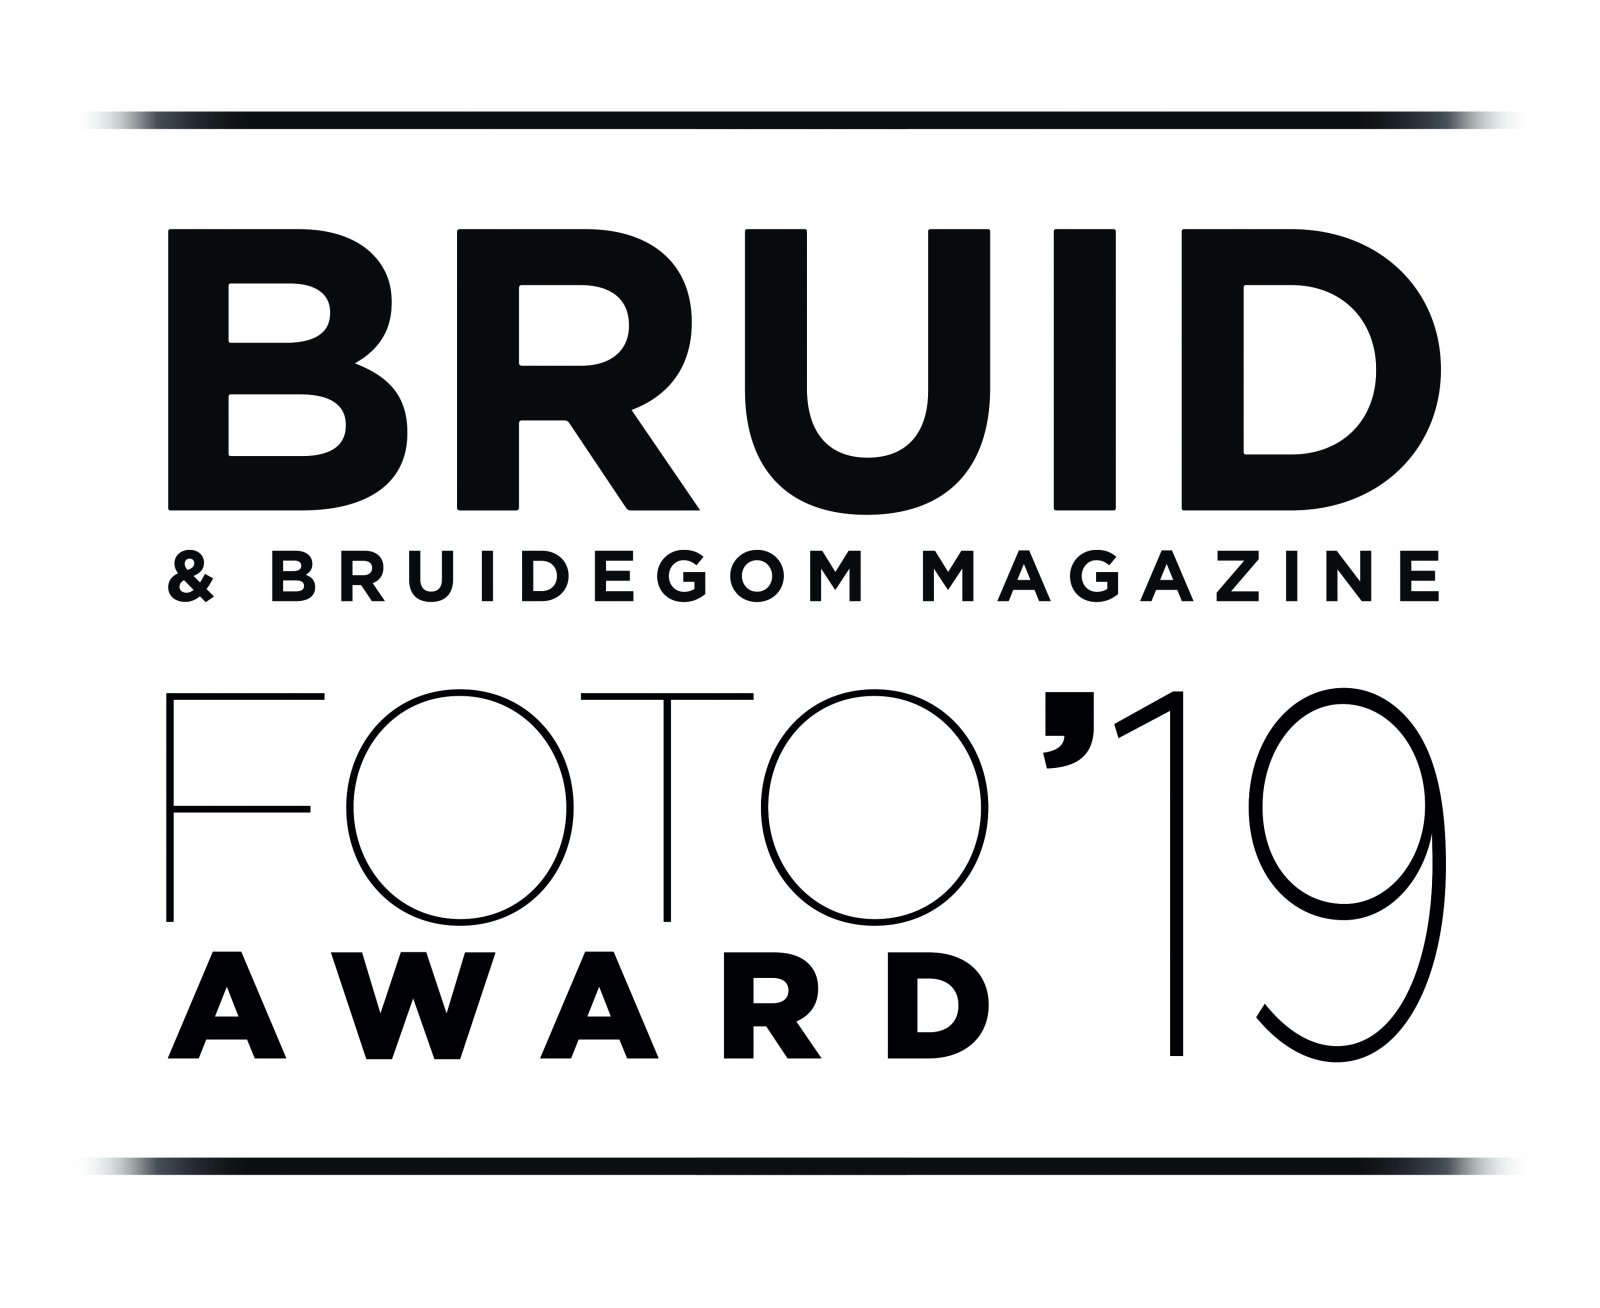 Bruidsfoto Award Bruid Magazine